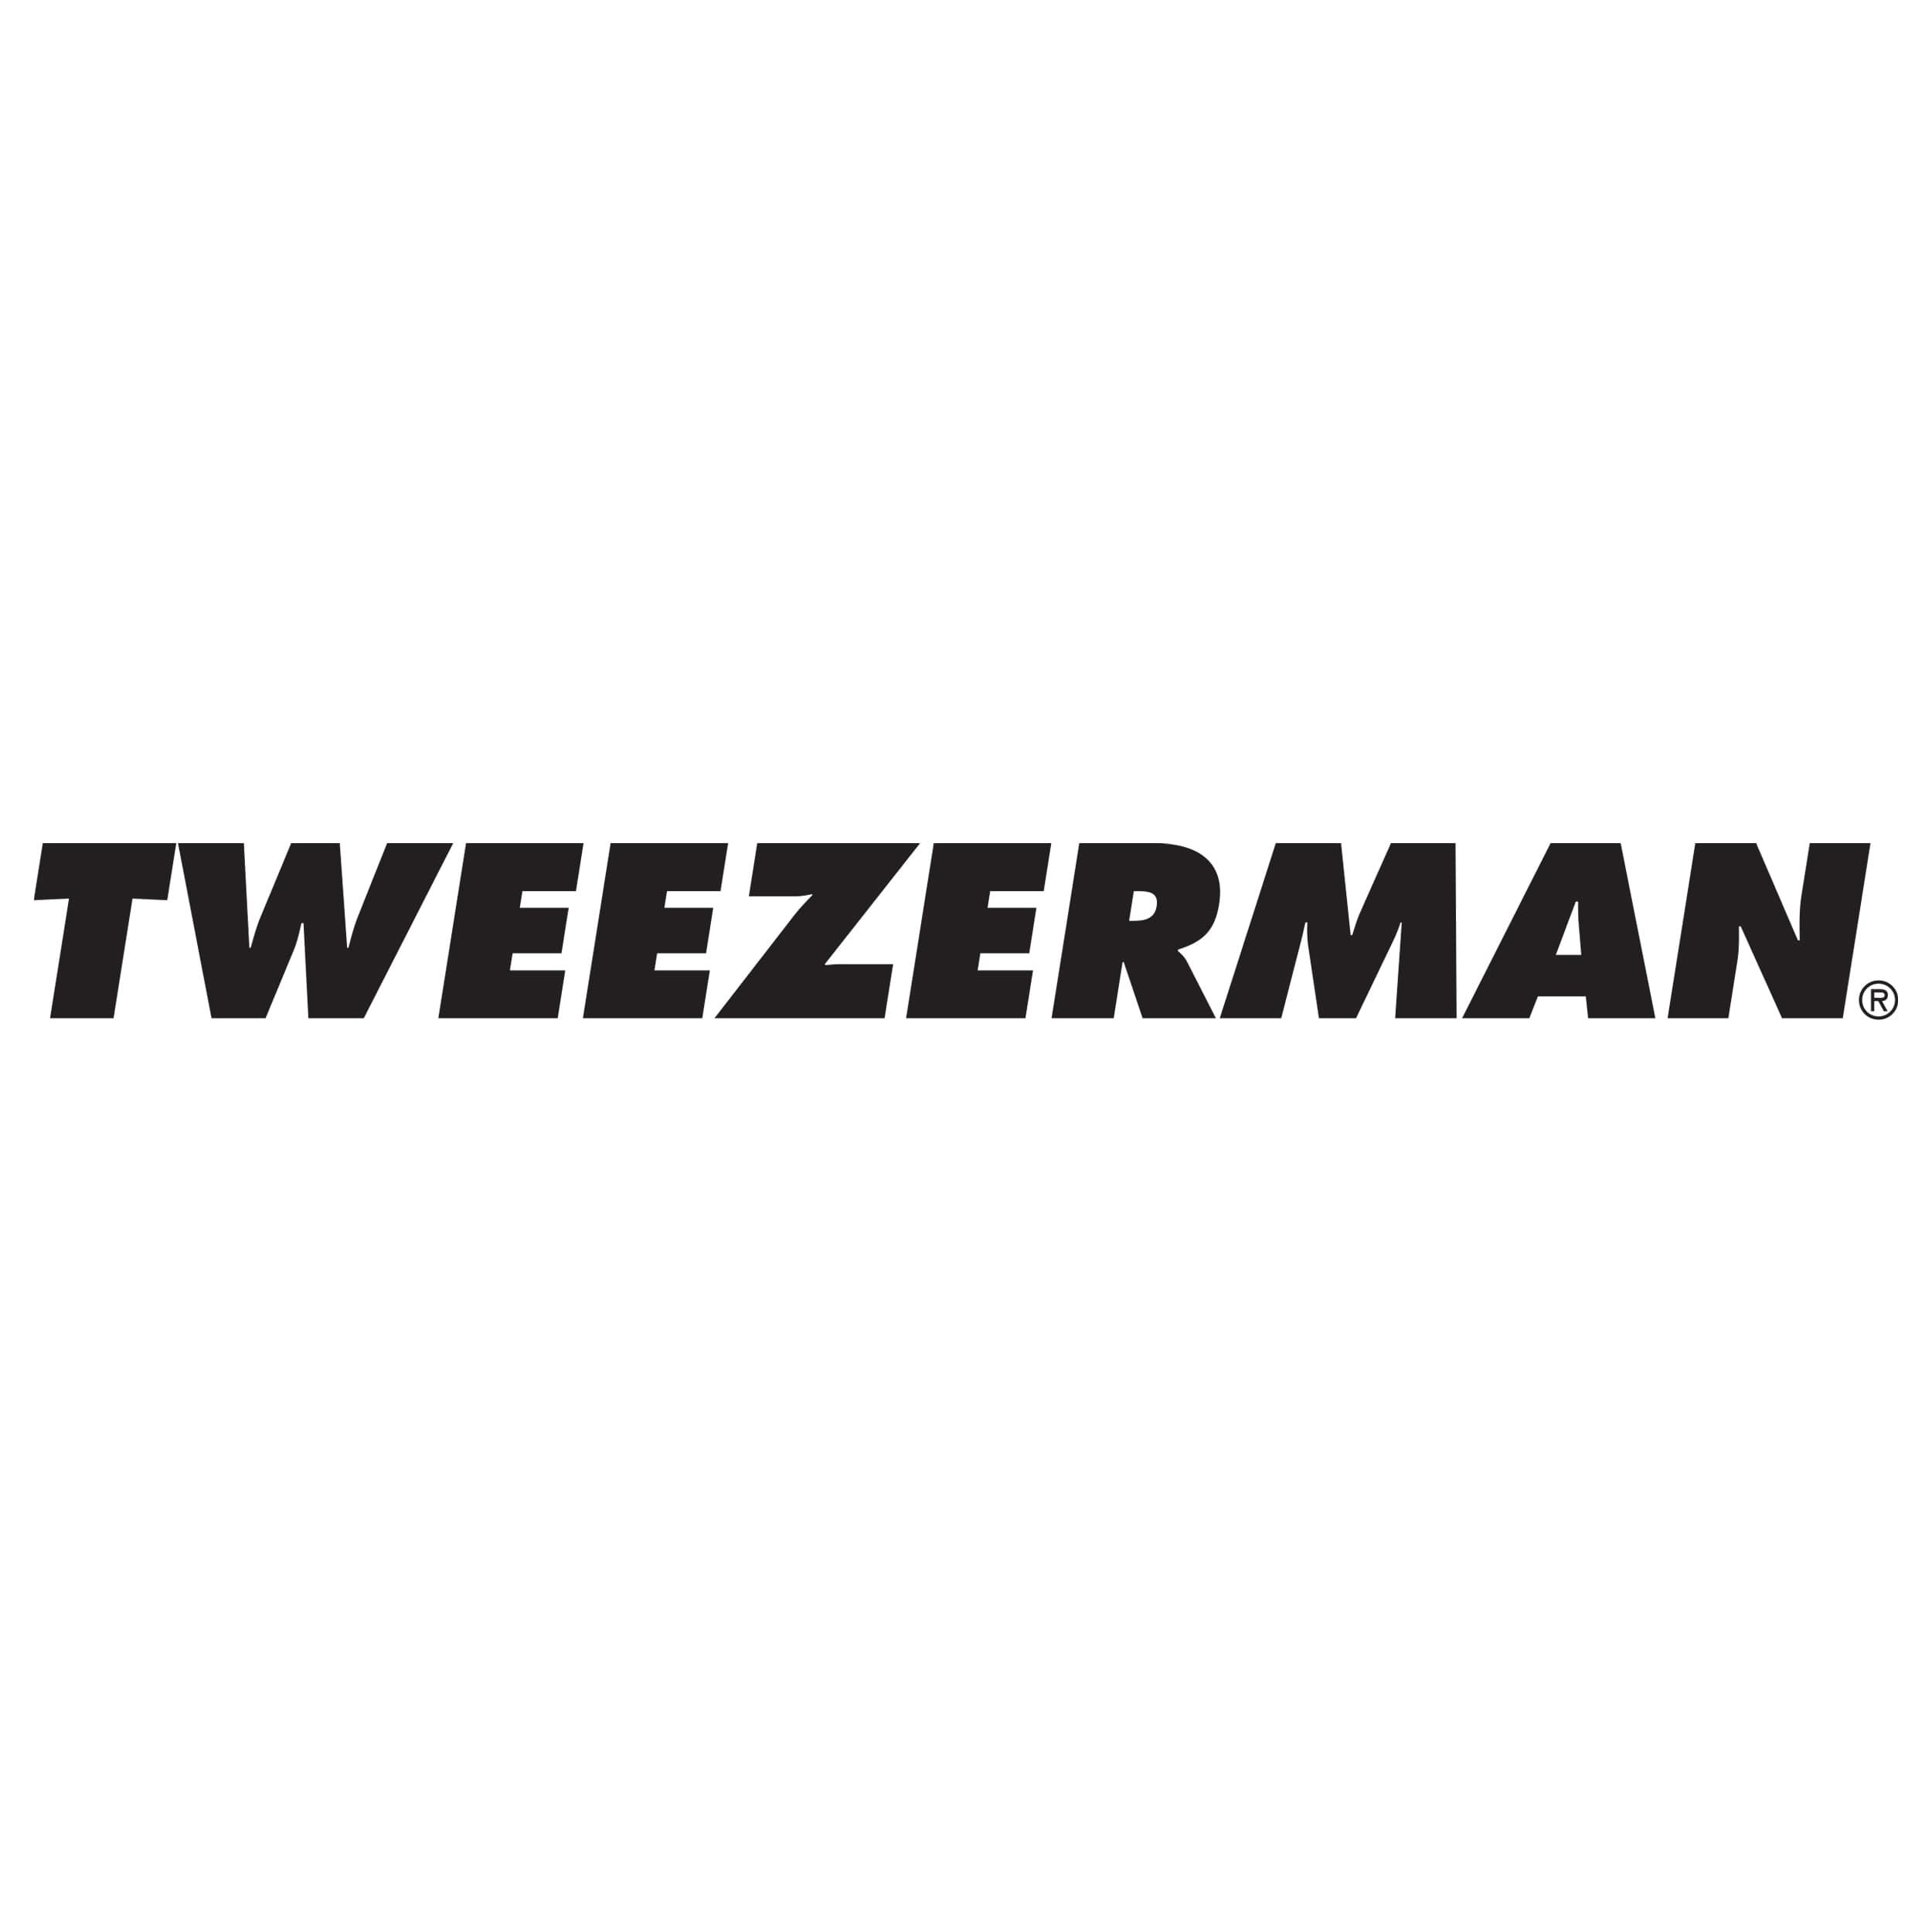 Procurl Lash Curler In Rose Gold Tweezerman